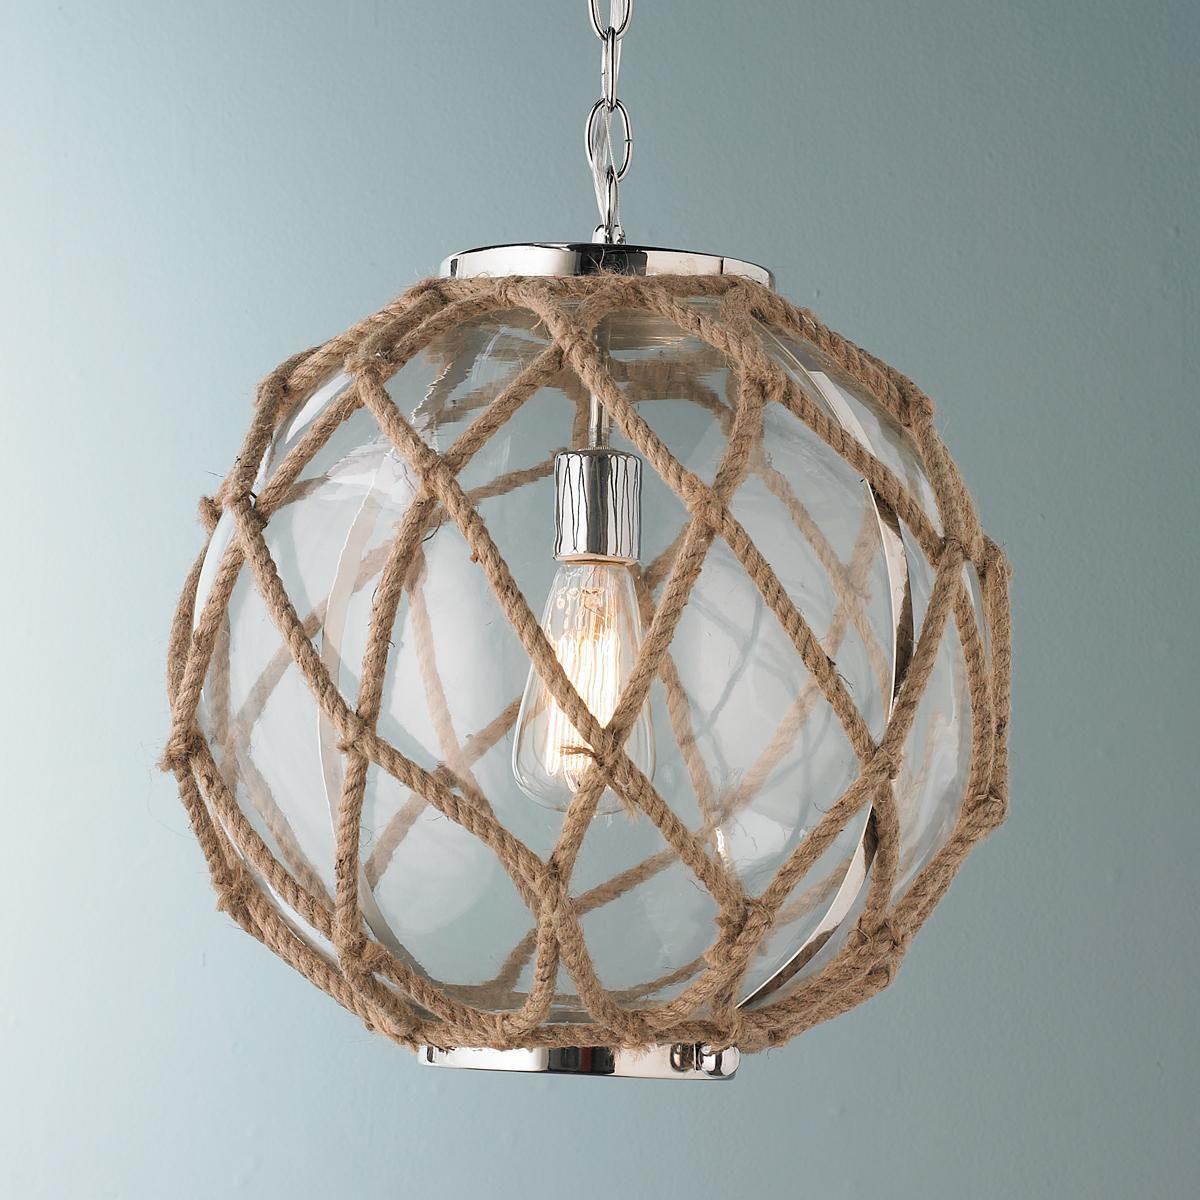 Jute Rope Nautical Pendant Nautical Pendant Lighting Nautical Chandelier Nautical Pendants